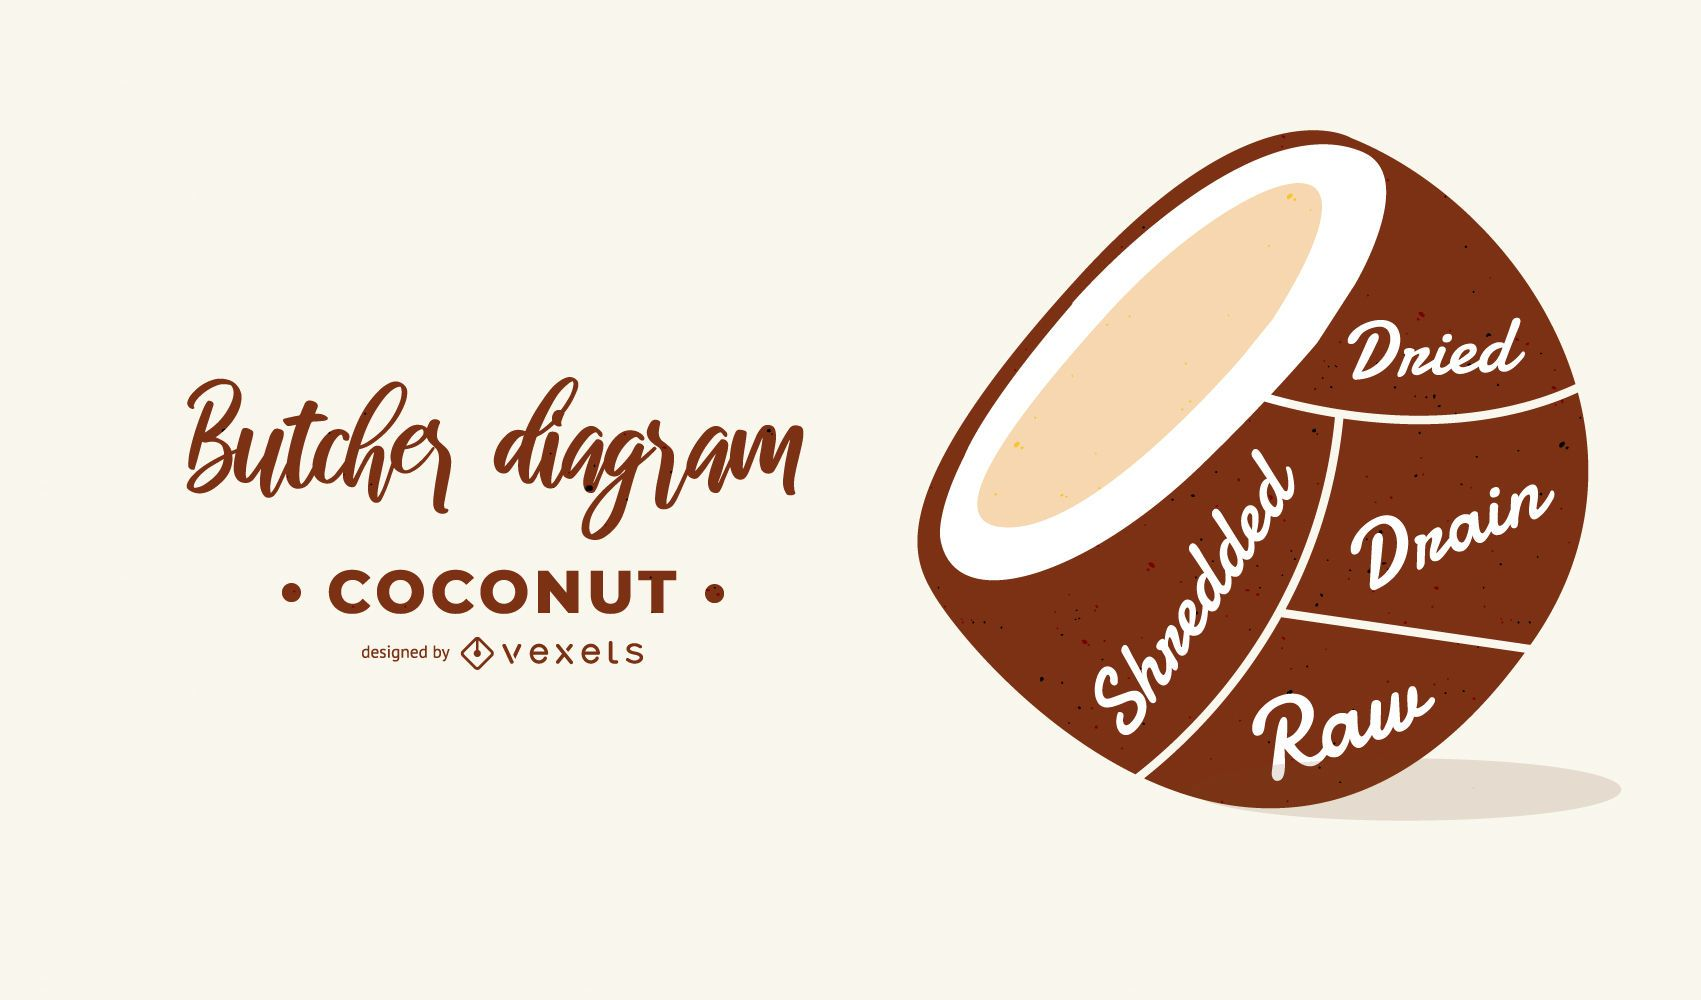 Coconut Butcher Diagram Design